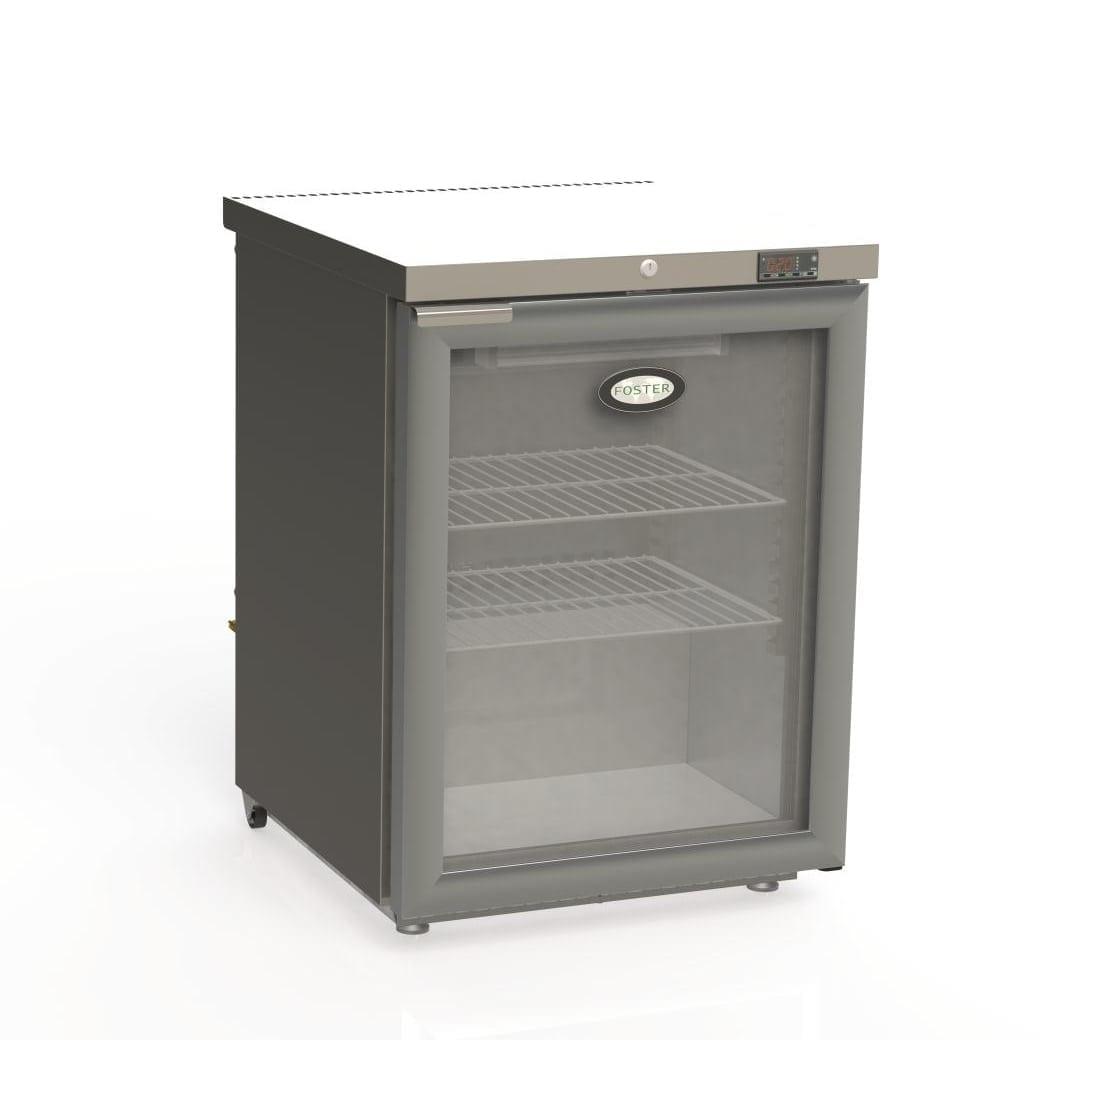 Foster 1 Glass Door 150Ltr Undercounter Fridge R290 (StSt Ex Alu In) (Direct)-0